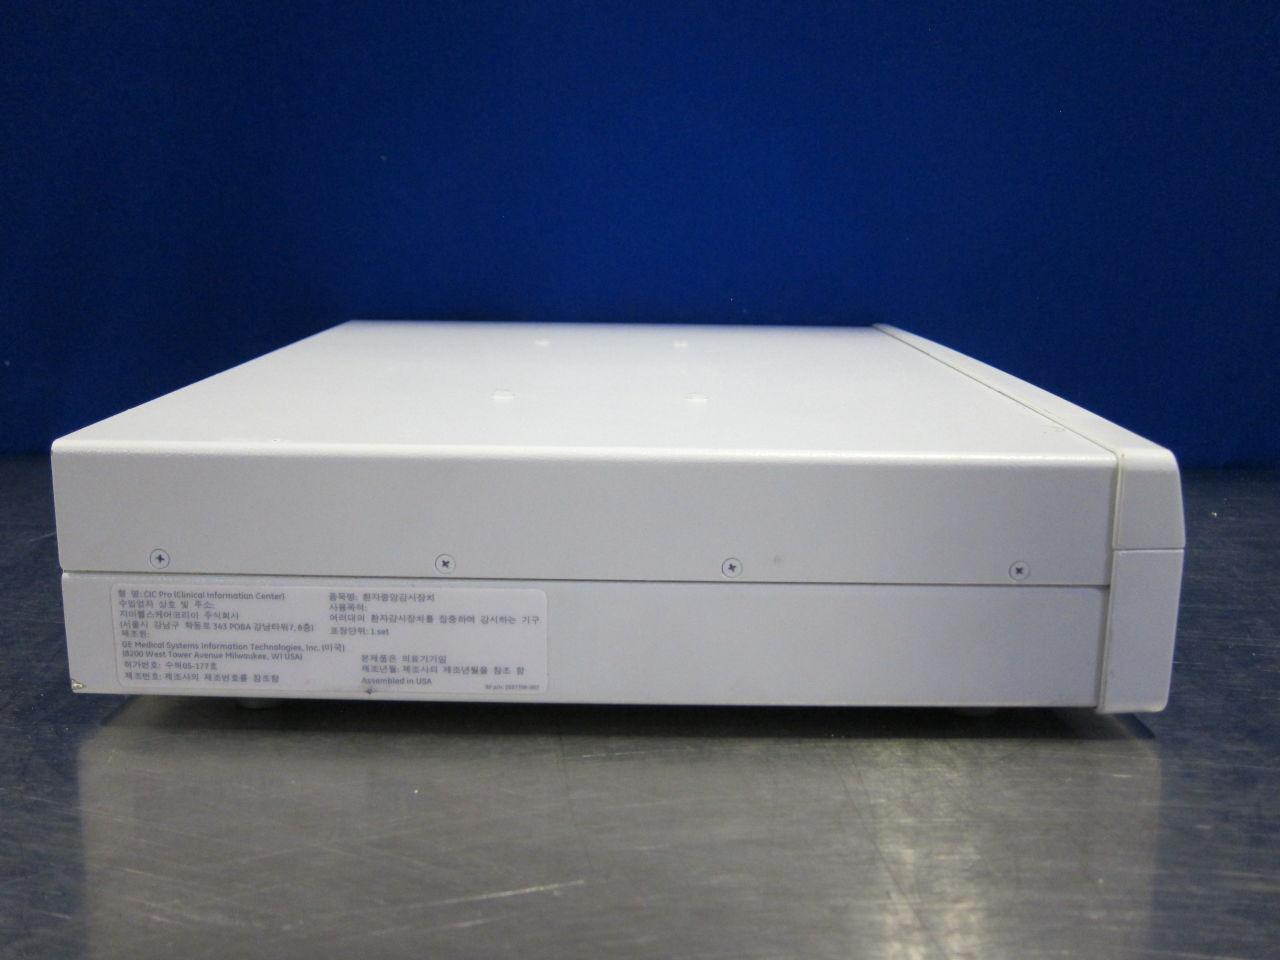 GE CIC Pro  - Lot of 3 Telemetry